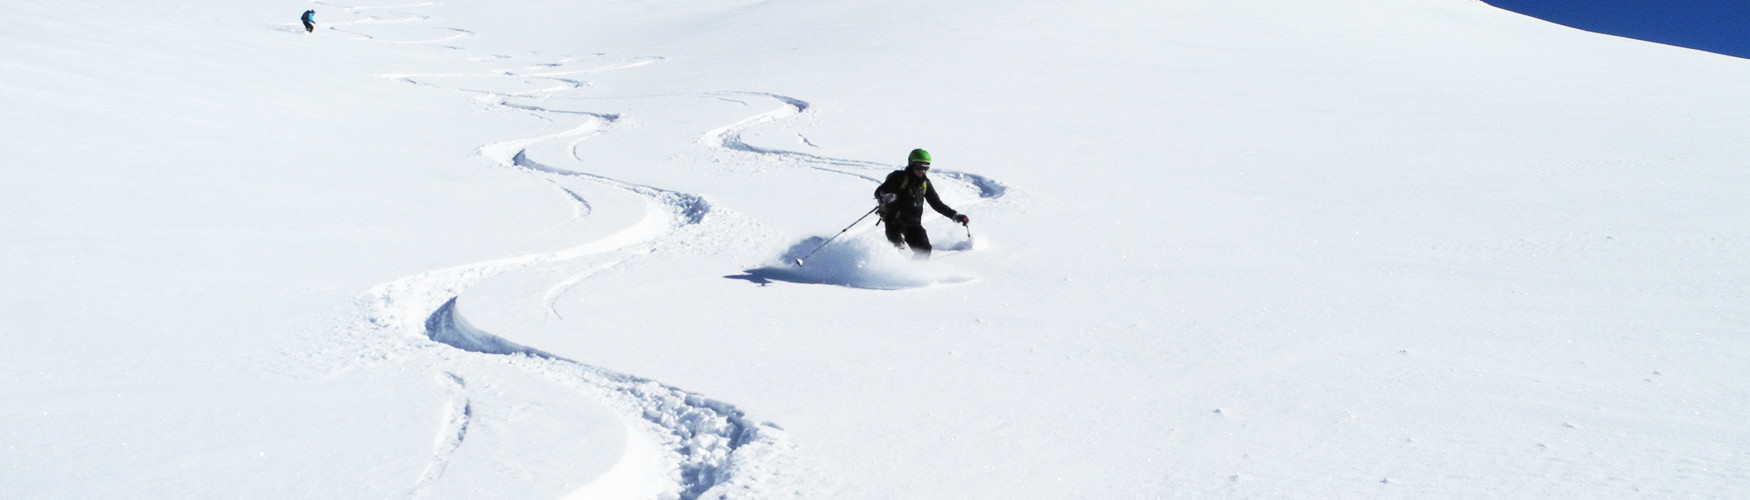 Skitouren Kurs, Skitourenkurs